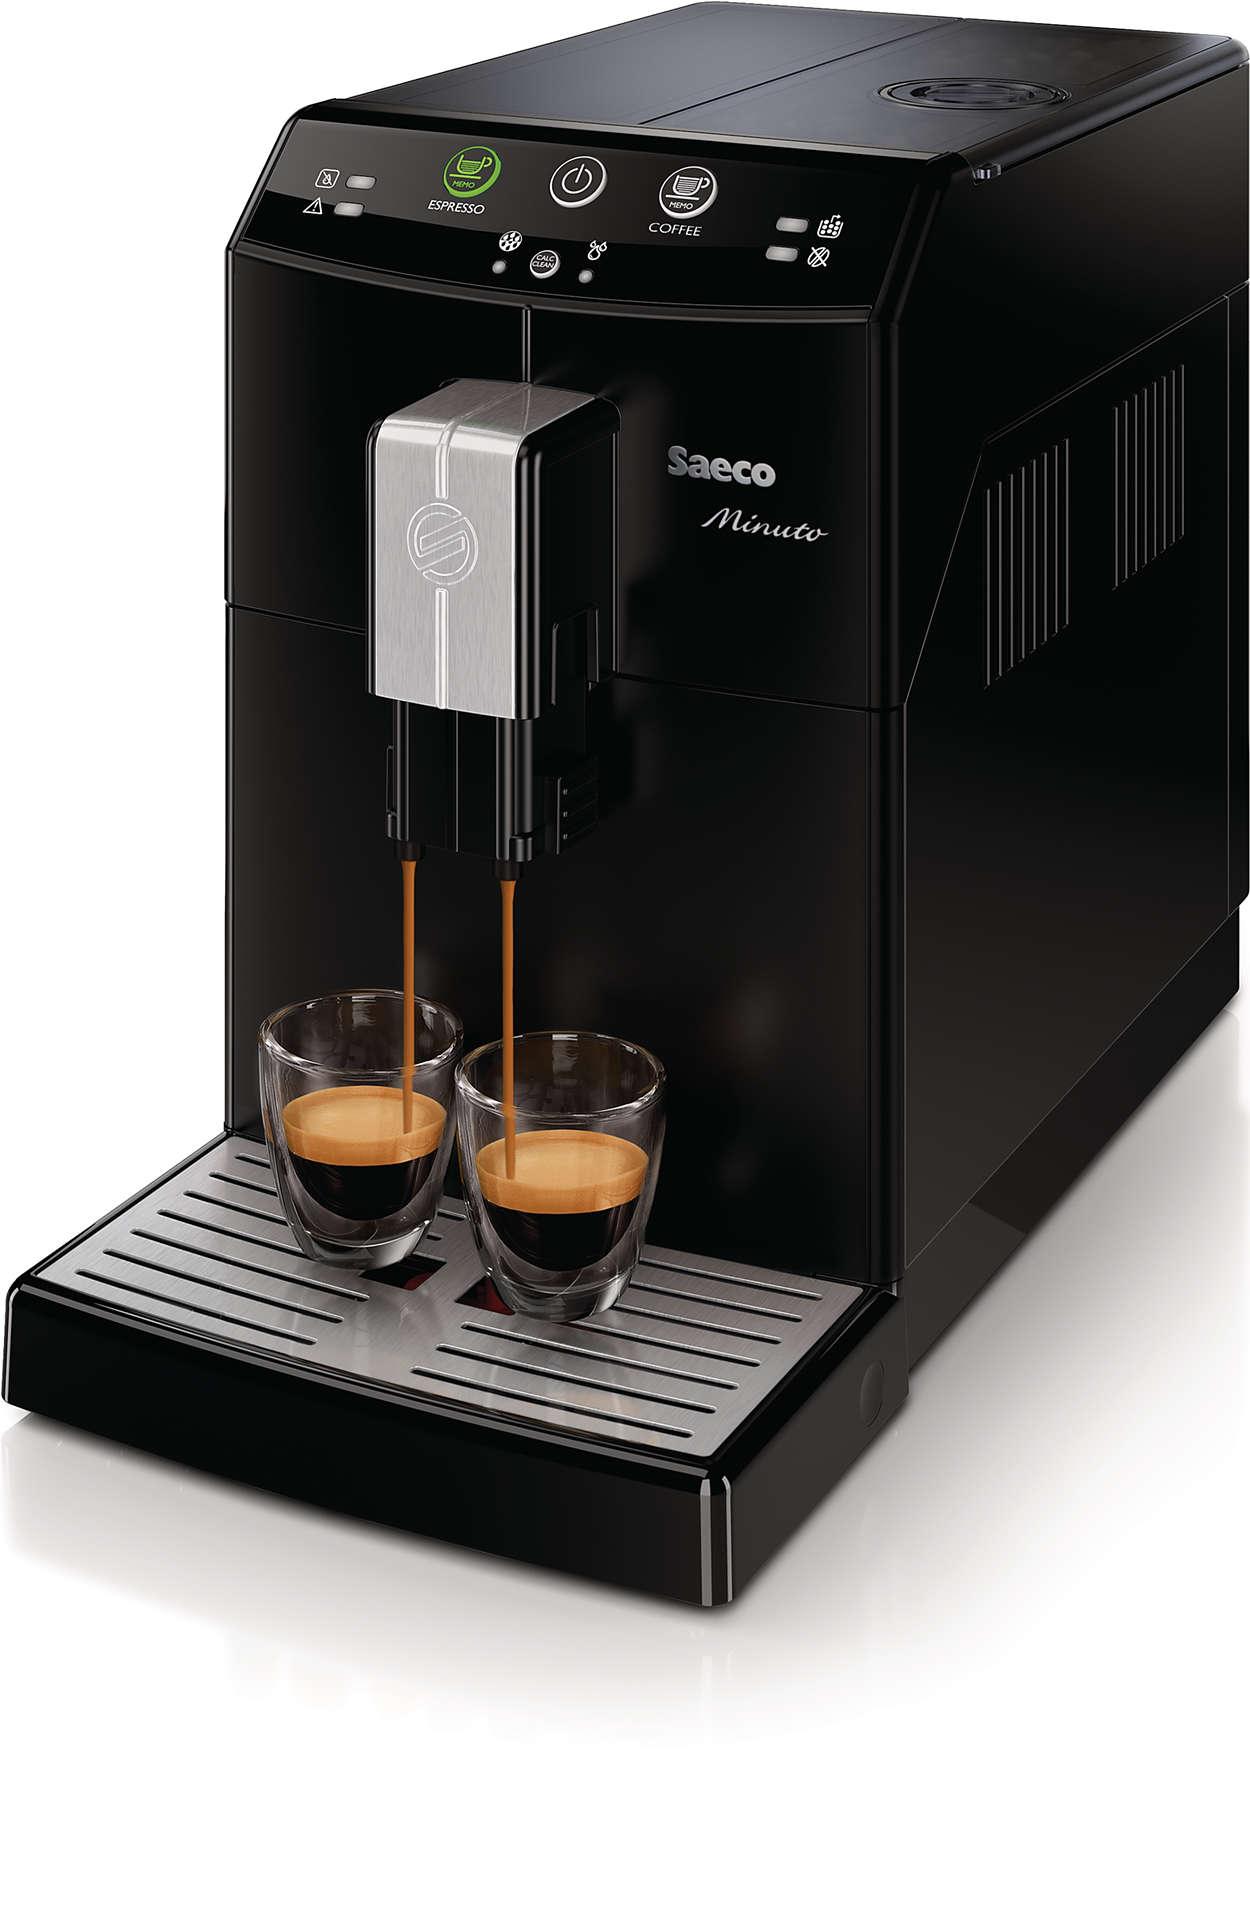 minuto machine espresso super automatique hd8760 01 saeco. Black Bedroom Furniture Sets. Home Design Ideas